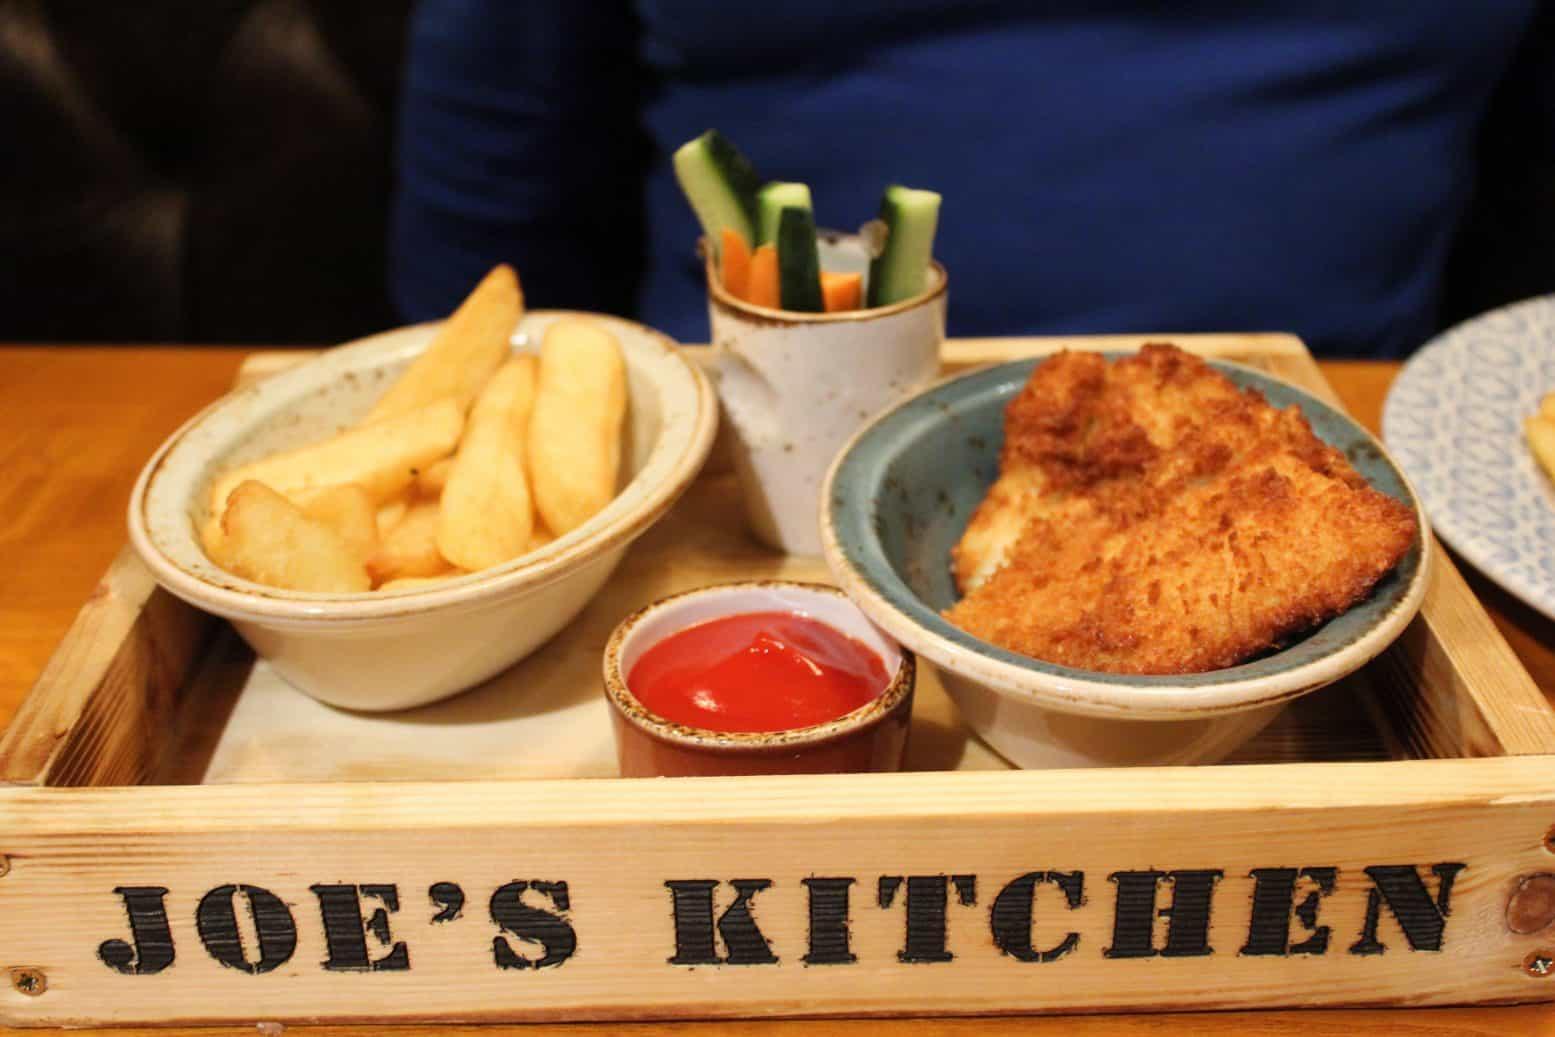 Joe S Kitchen Ludgate Hill London Great Family Friendly  # Muebles Rouge Bubua